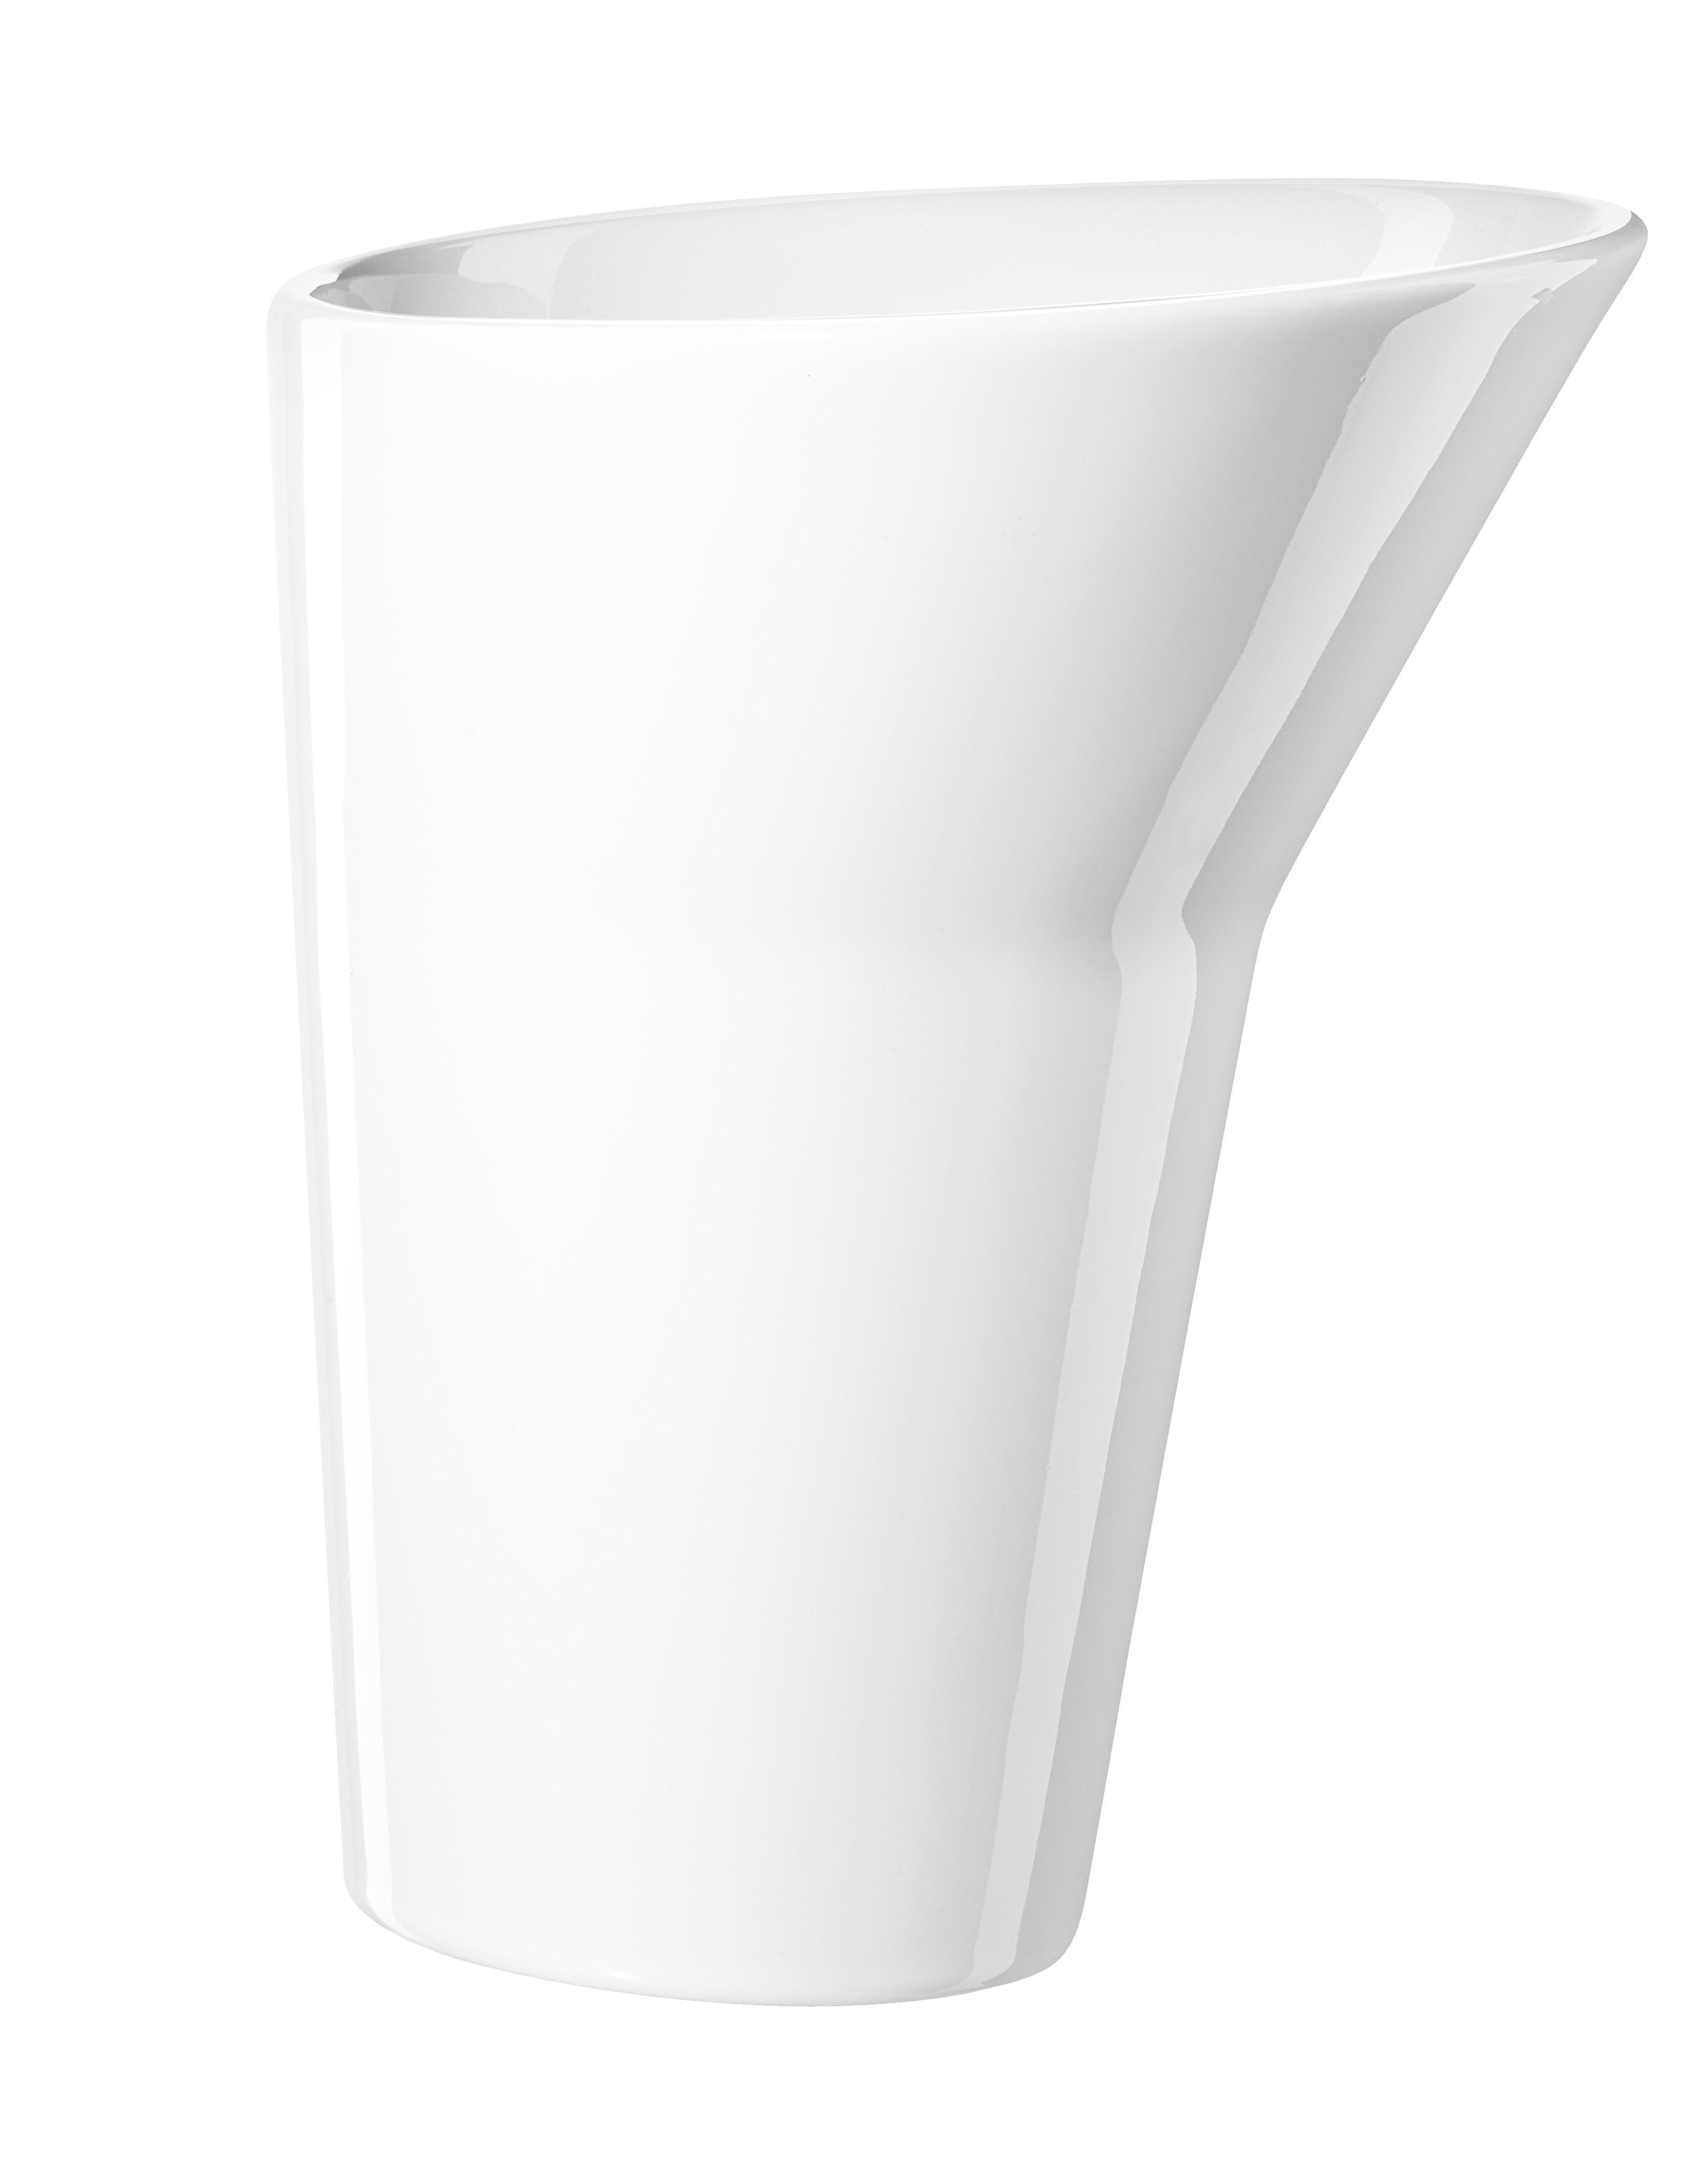 vase wei produkte home by asa die asa selection wohnwelten. Black Bedroom Furniture Sets. Home Design Ideas